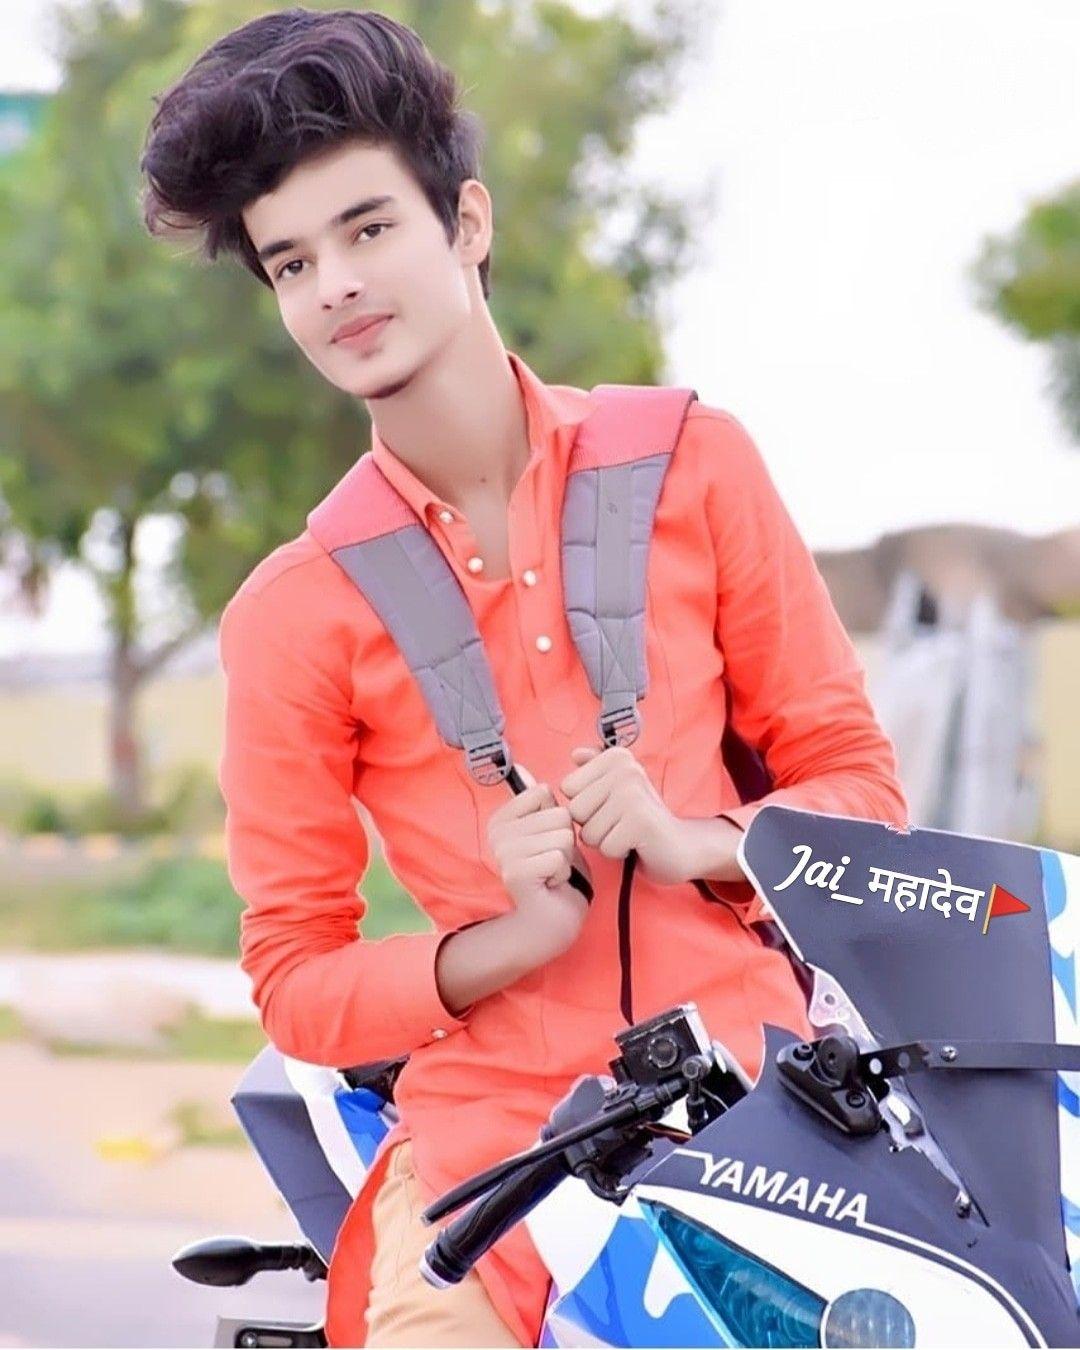 Cute Or Not Comments Plz Shiv Sharma Shivv Sharma Shivam Photography Poses For Men Stylish Pic Cute Boy Photo